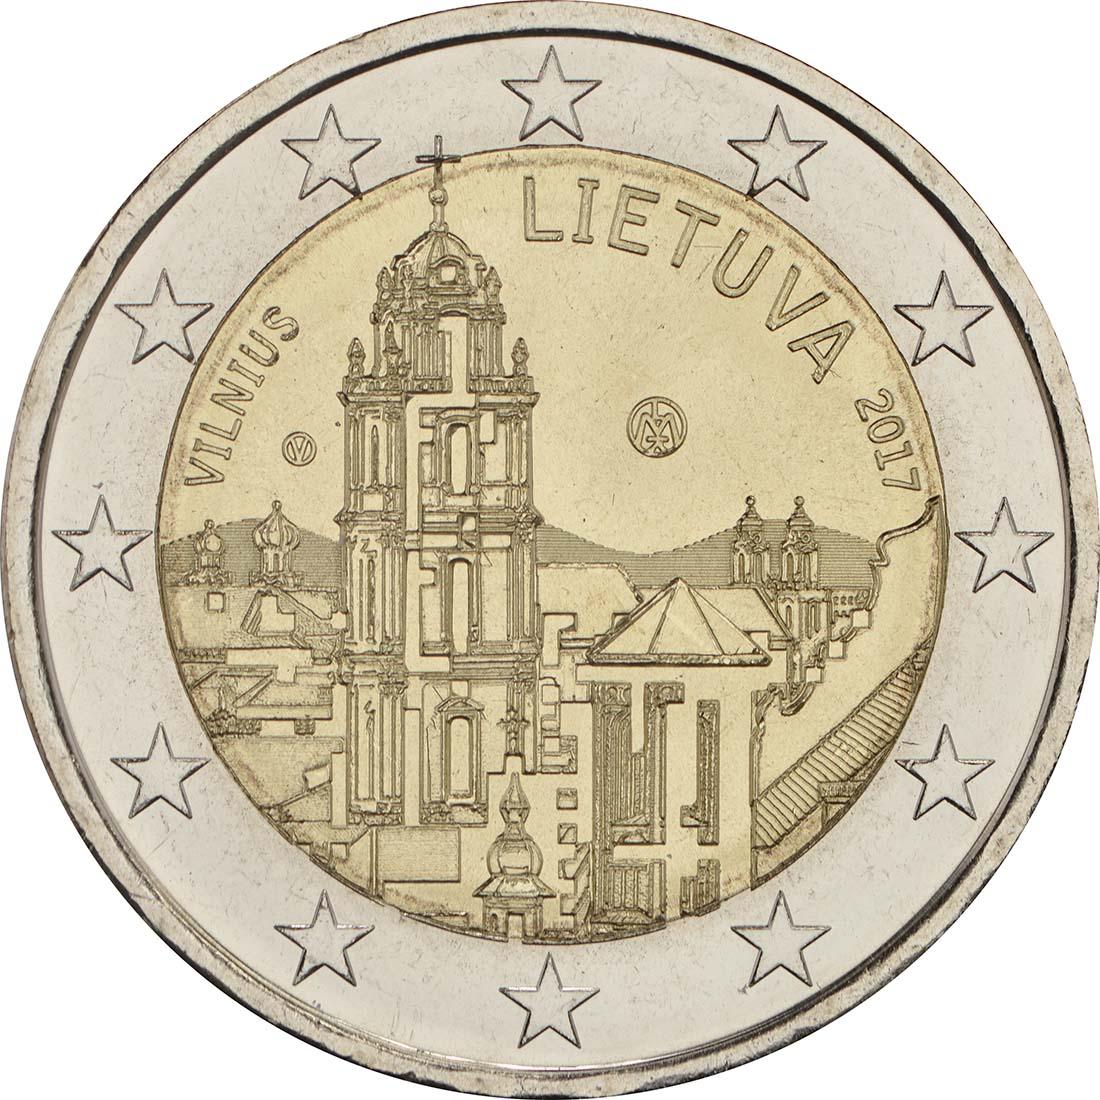 2017 280 Litauen Vilnius.jpg